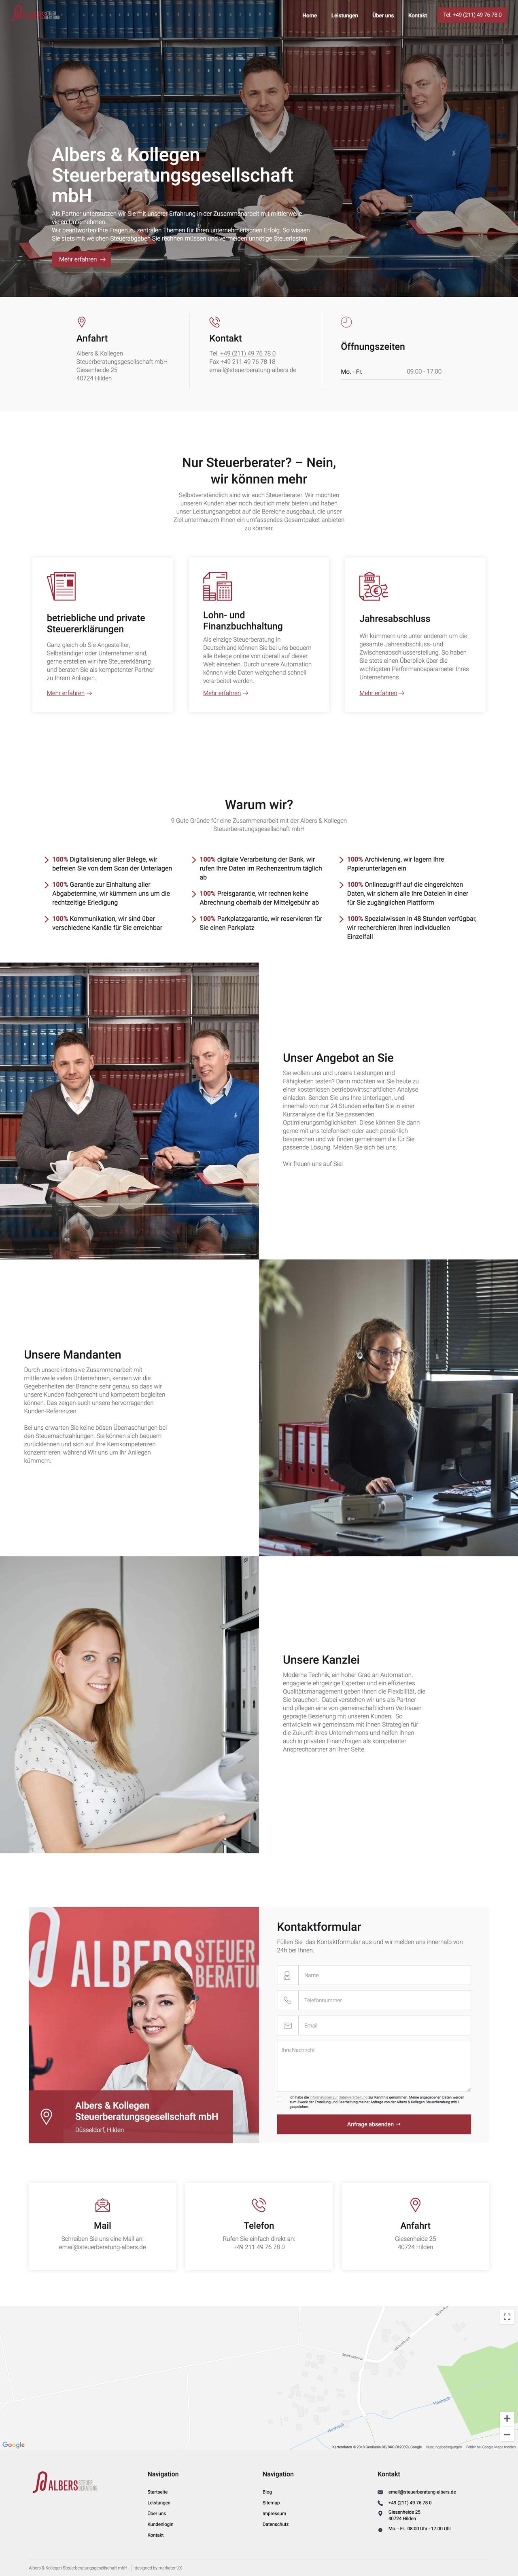 Albers Steuerberatung Webdesign Referenz